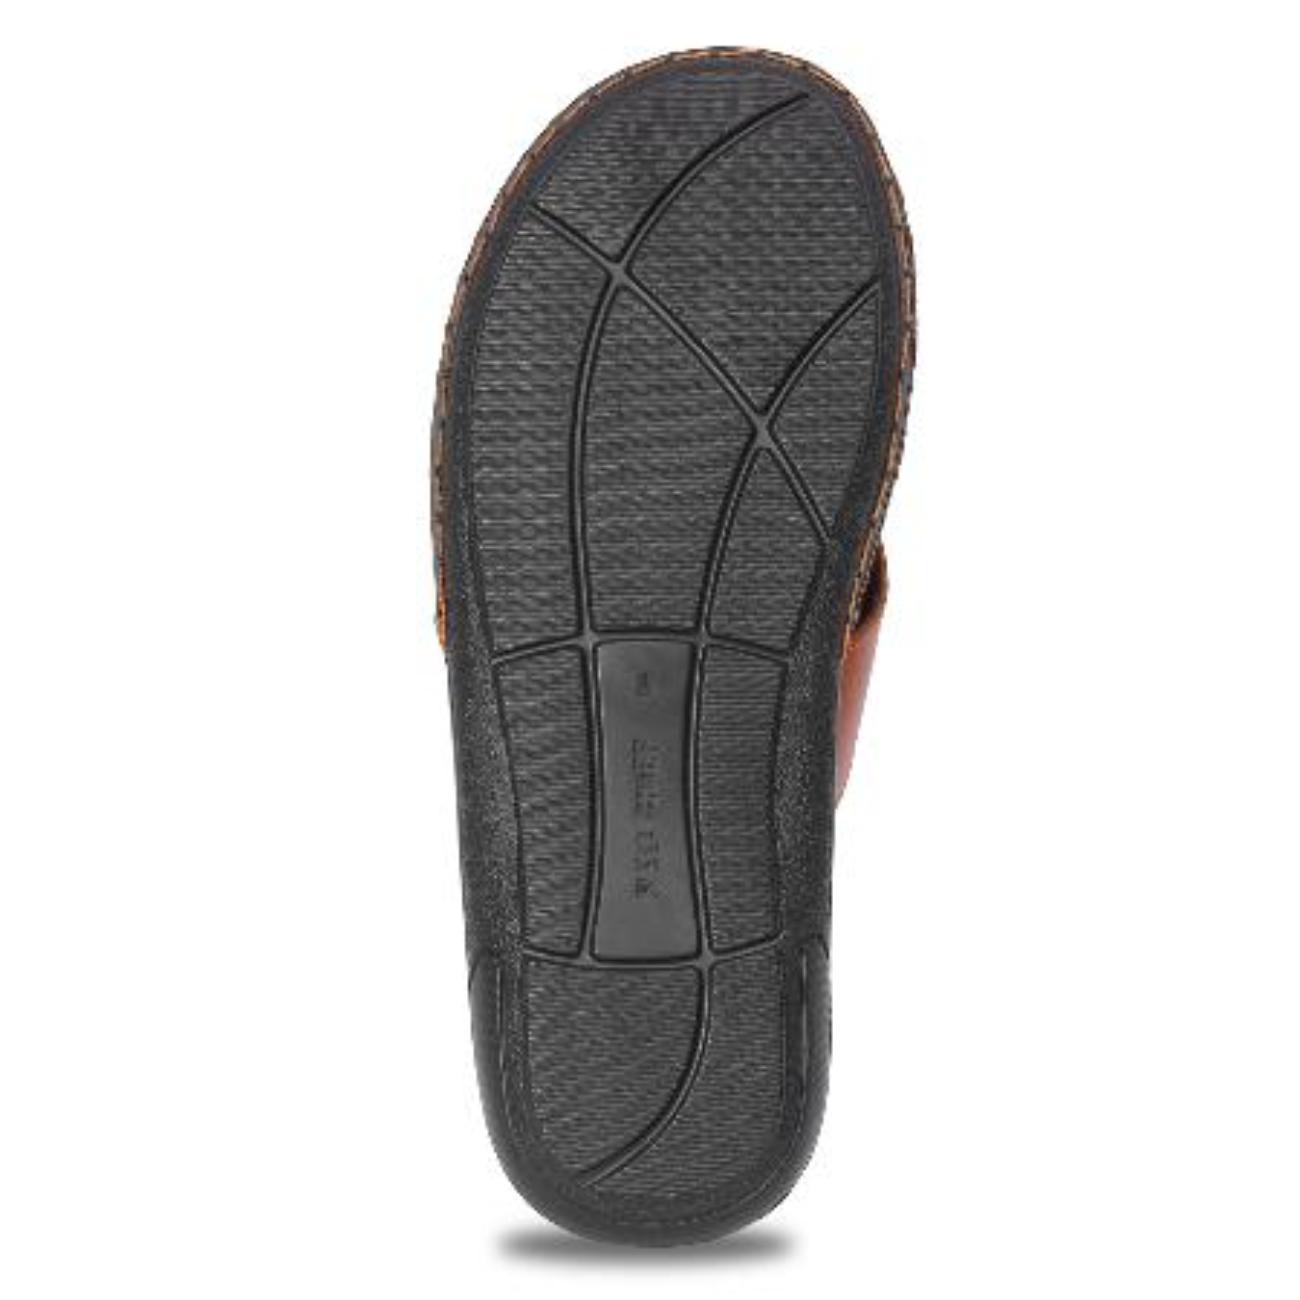 tan slip-on slippers rubber sole